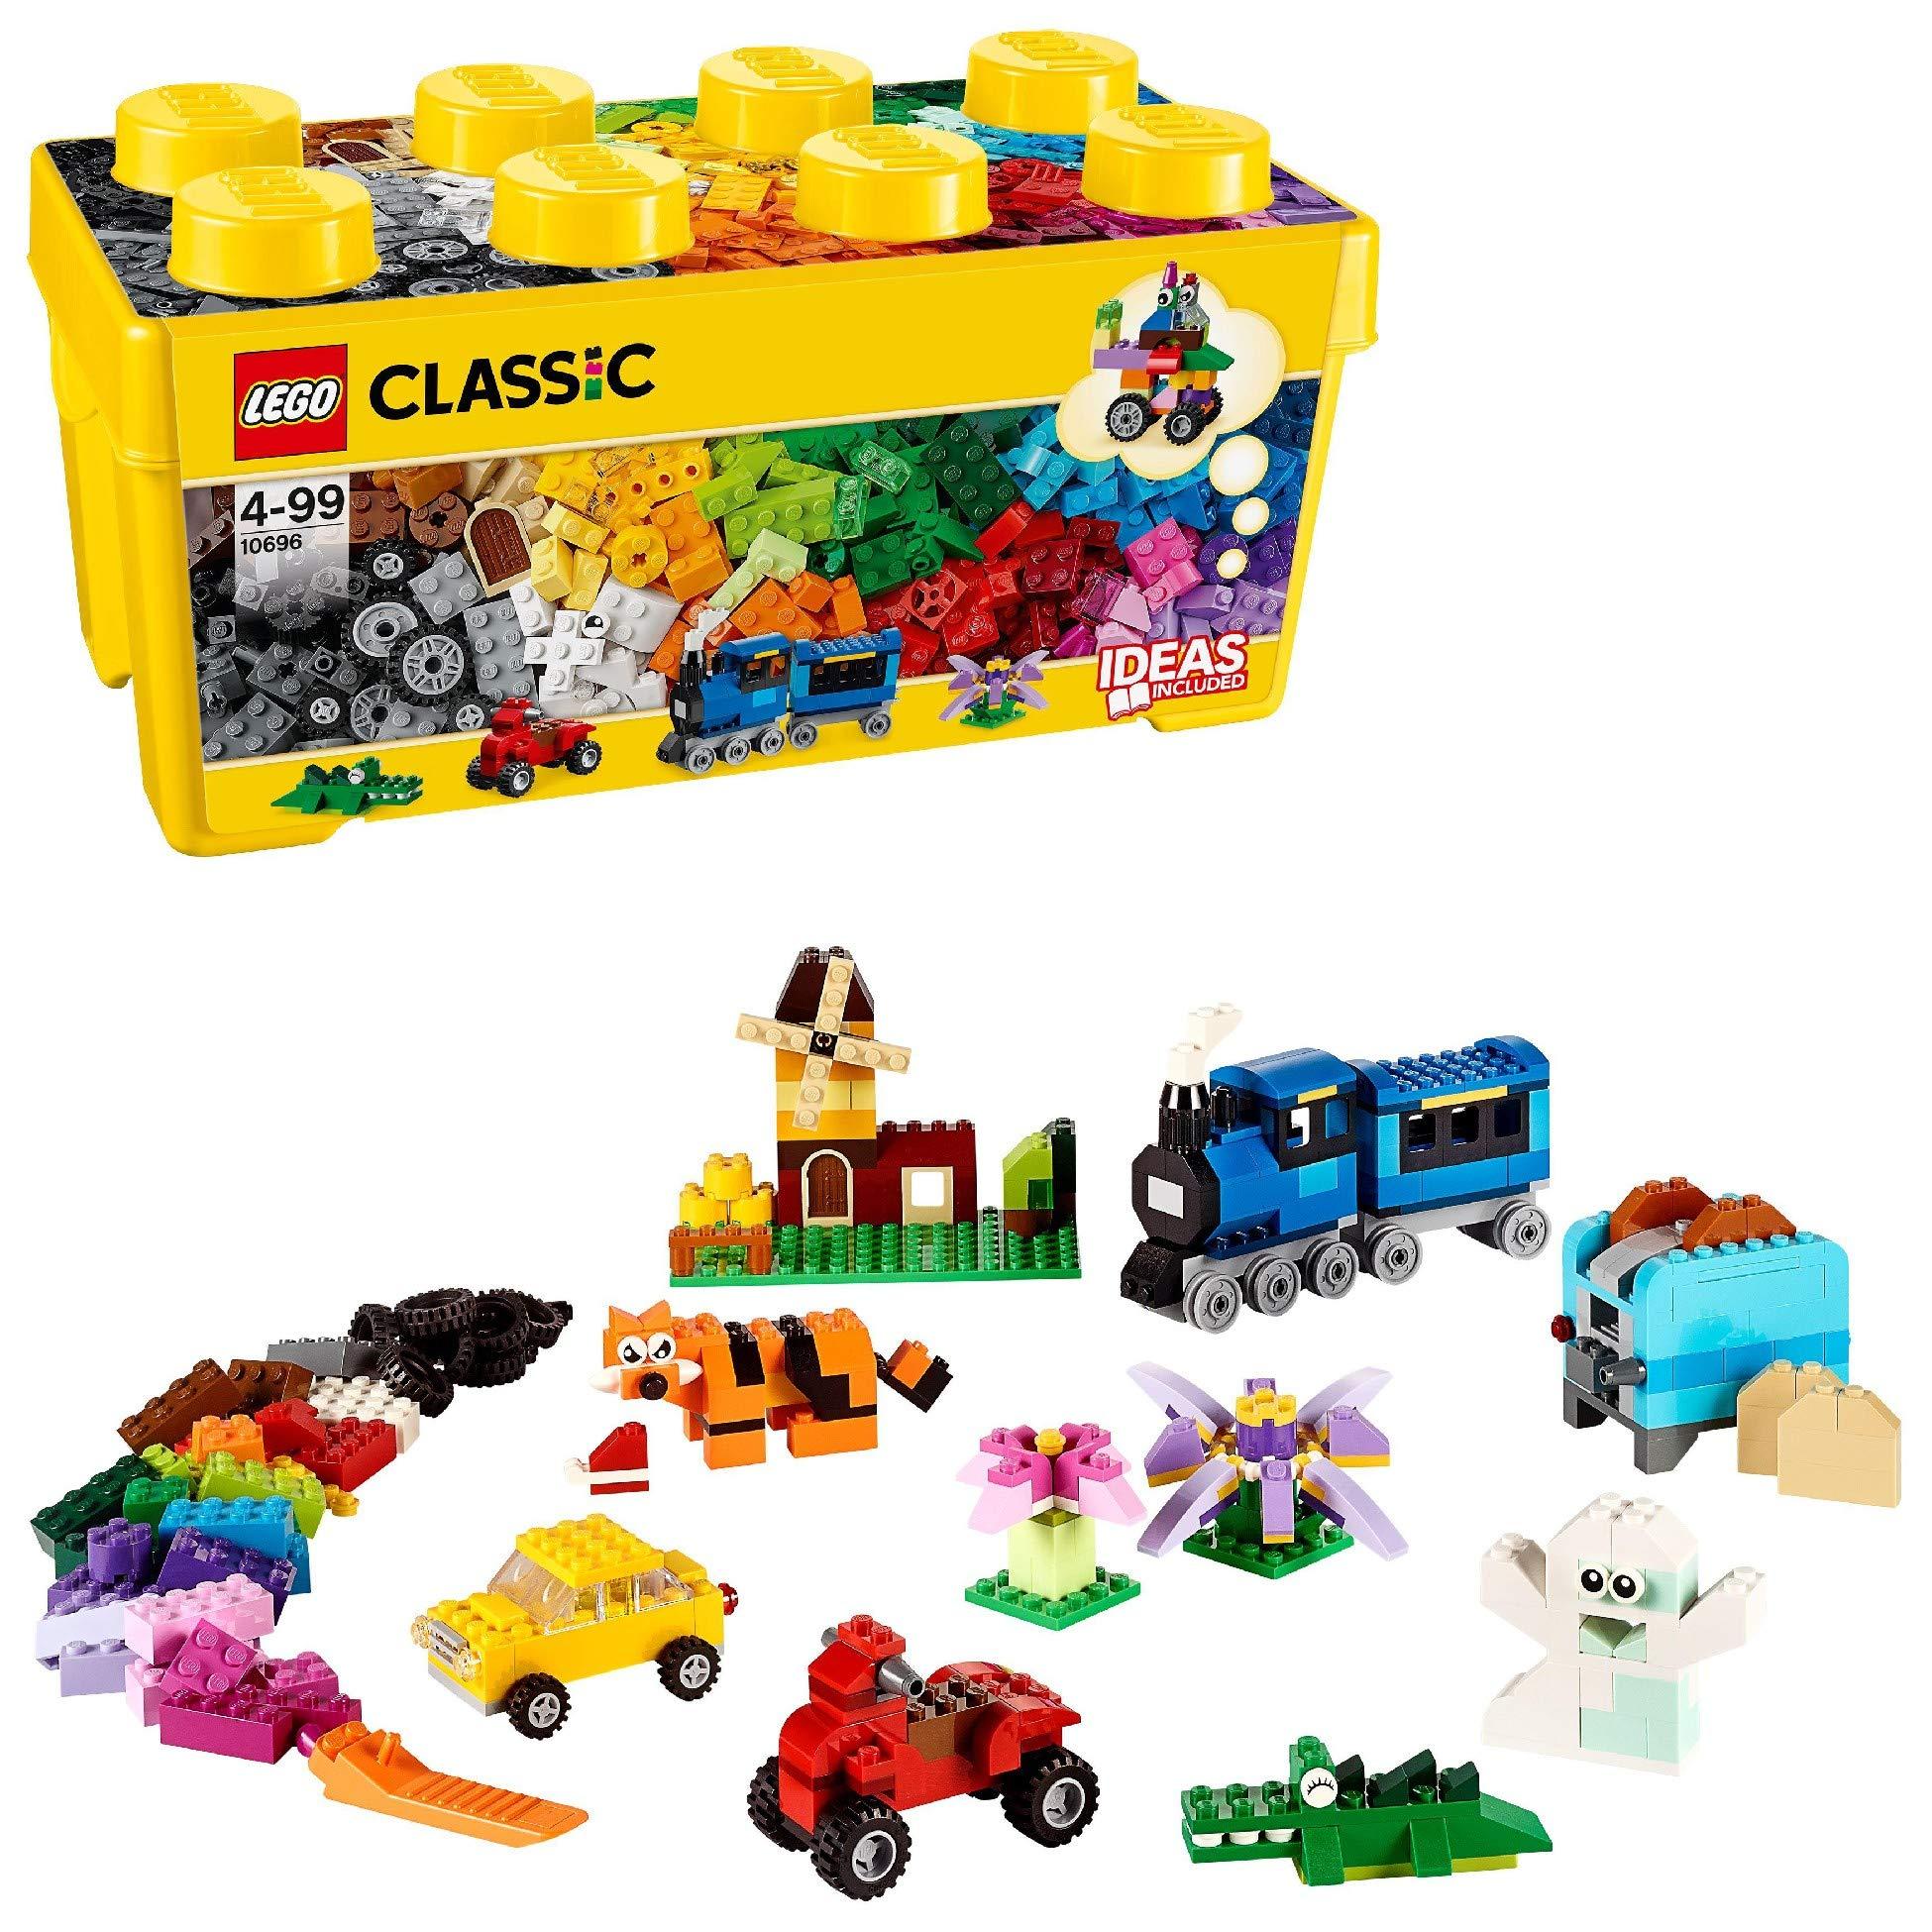 LEGO 10696 Classic Medium Creative Brick Box, Easy Toy Storage, Lego Masters Fan Gift                LEGO60226CityMarsResearchShuttleSpaceshipConstructionToysforKidsinspiredbyNASAwithRoverandDrone                LEGO31058CreatorMightyDinosaursToy,3in1Model,TriceratopsandPterodactylDinosaurFigures,ModularBuildingSystem                LEGO42093TechnicChevroletCorvetteZR1RaceCar,2in1HotRodToyCarModel,RacingVehiclesCollection                LEGO76895SpeedChampionsFerrariF8TributoRacerToy,withRacingDriverMinifigure,RaceCarsBuildingSets